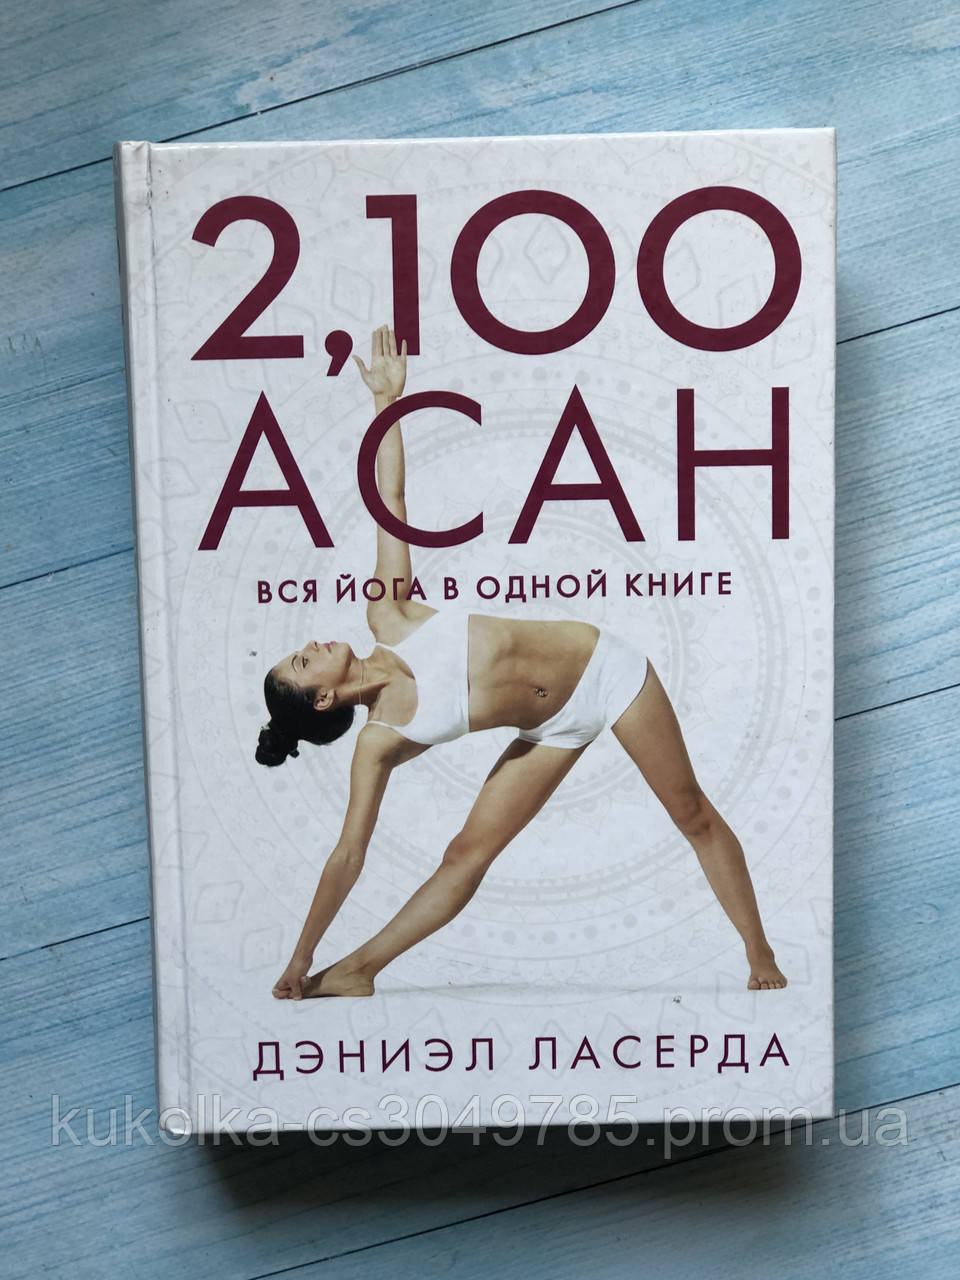 """ 2,100 асан. Вся йога в одной книге .» Дэниэл Ласэрда"